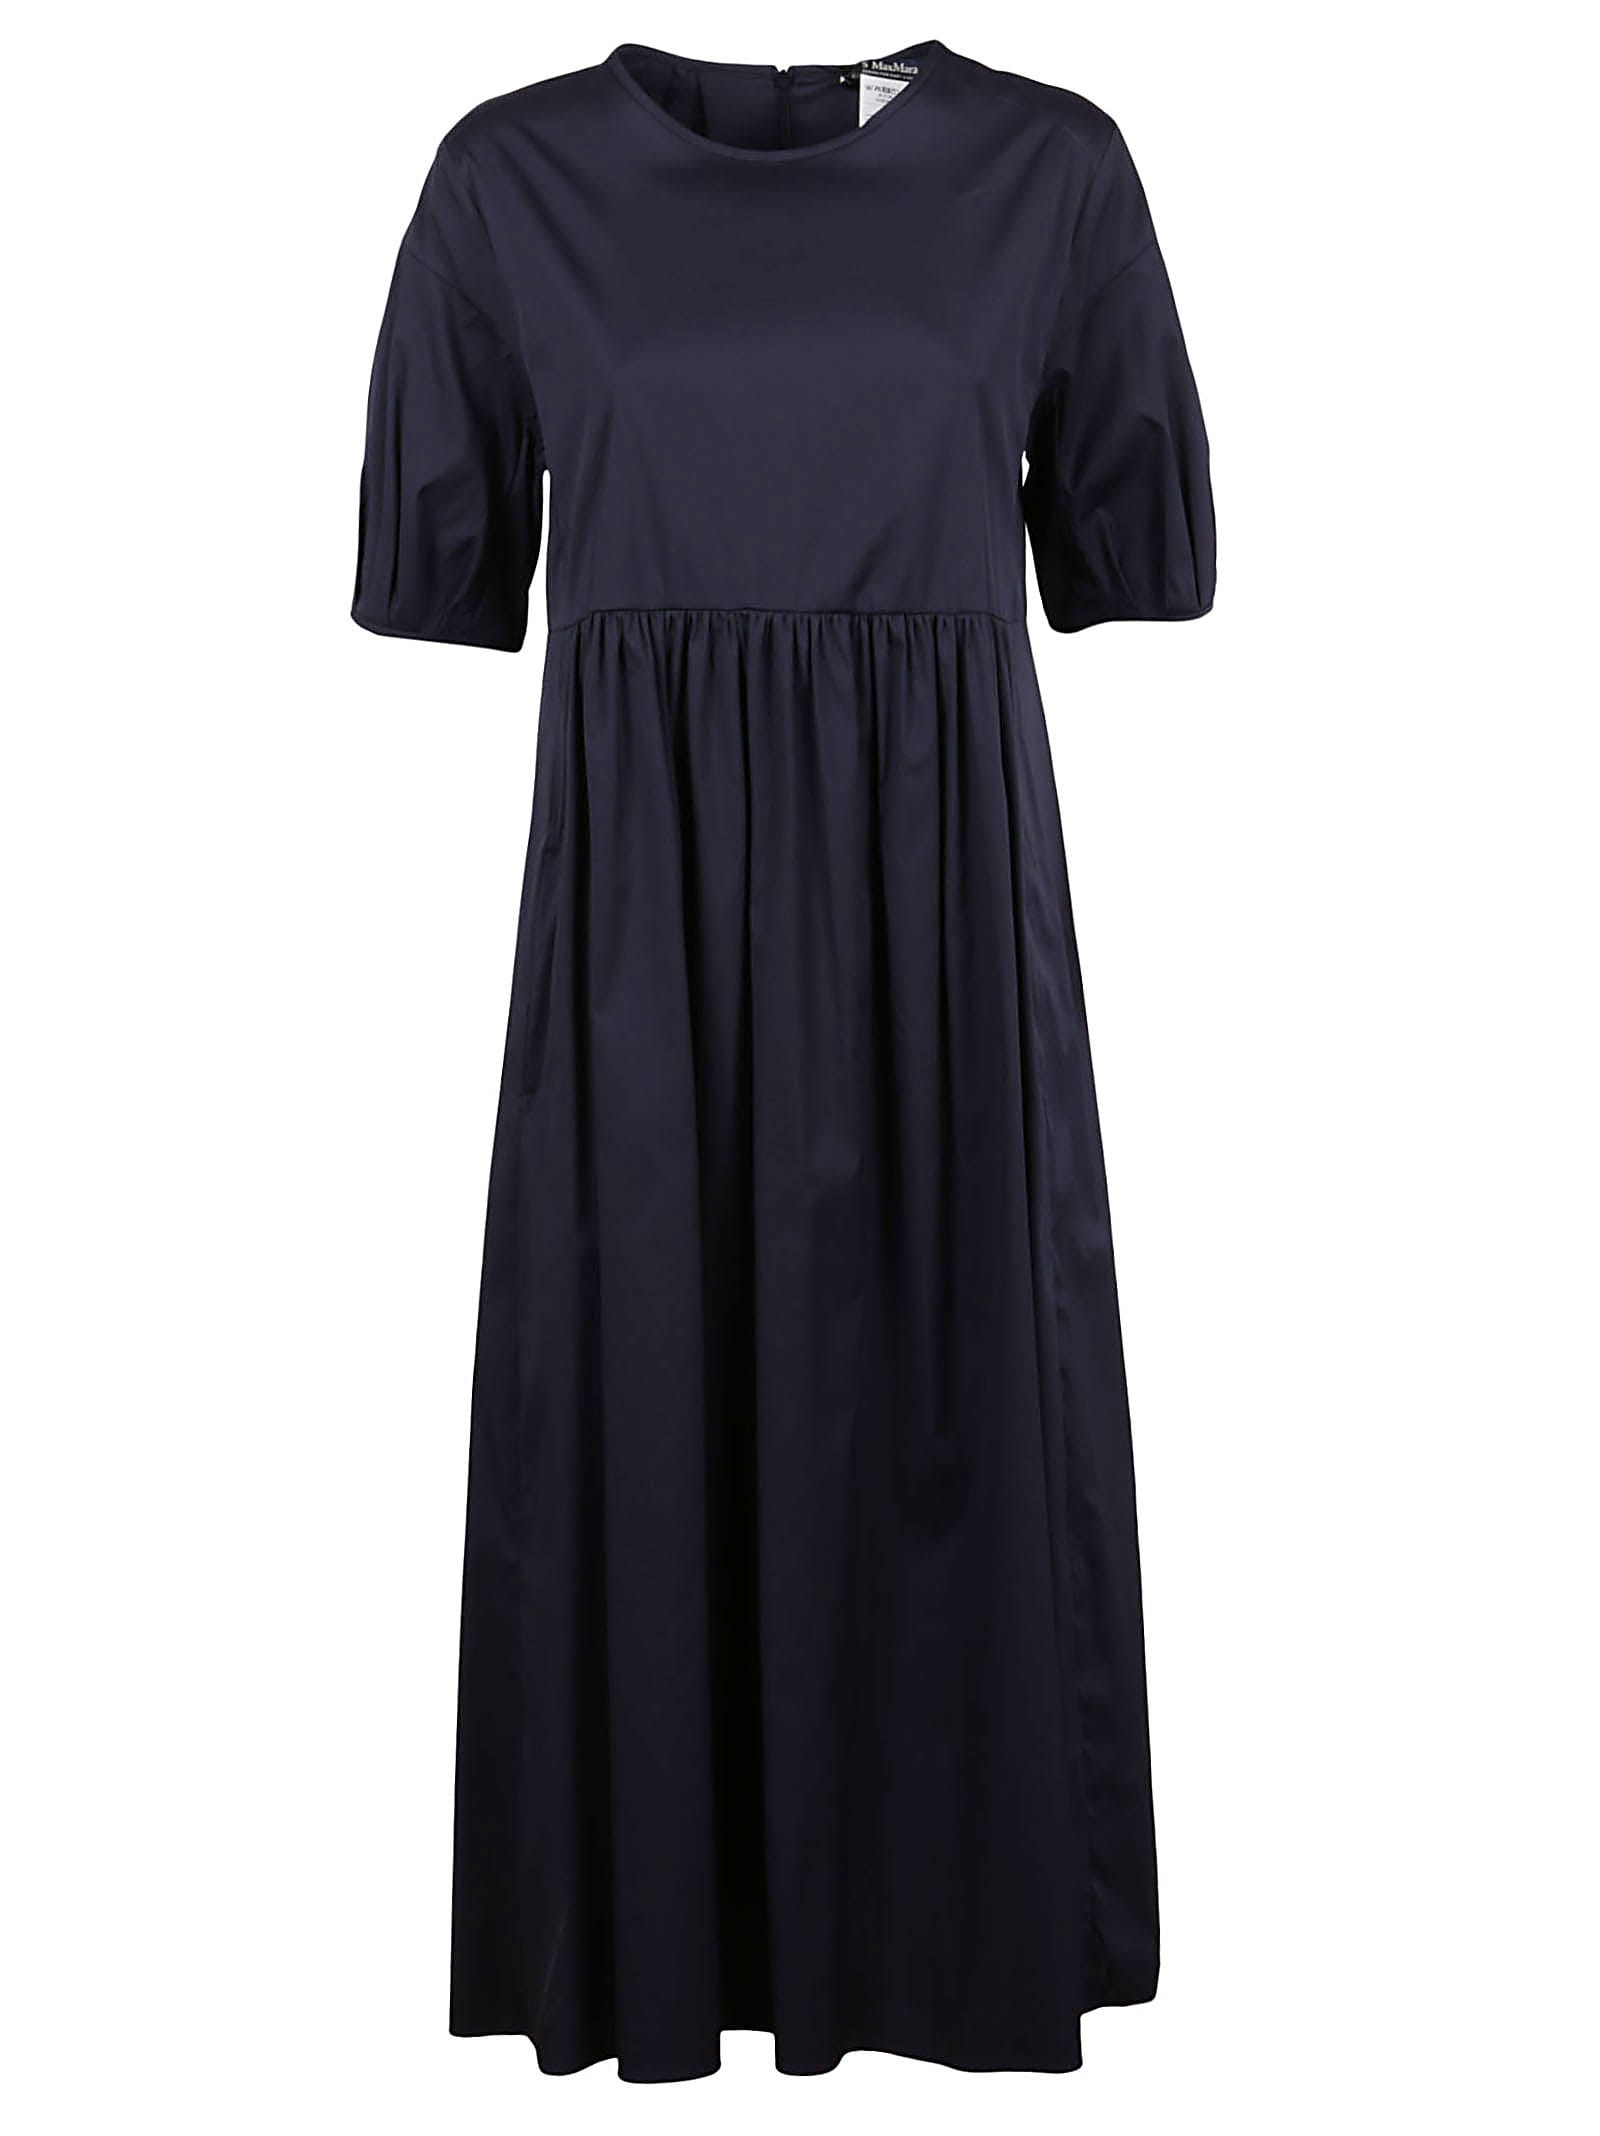 Buy S Max Mara Blue Cotton Dress online, shop S Max Mara with free shipping